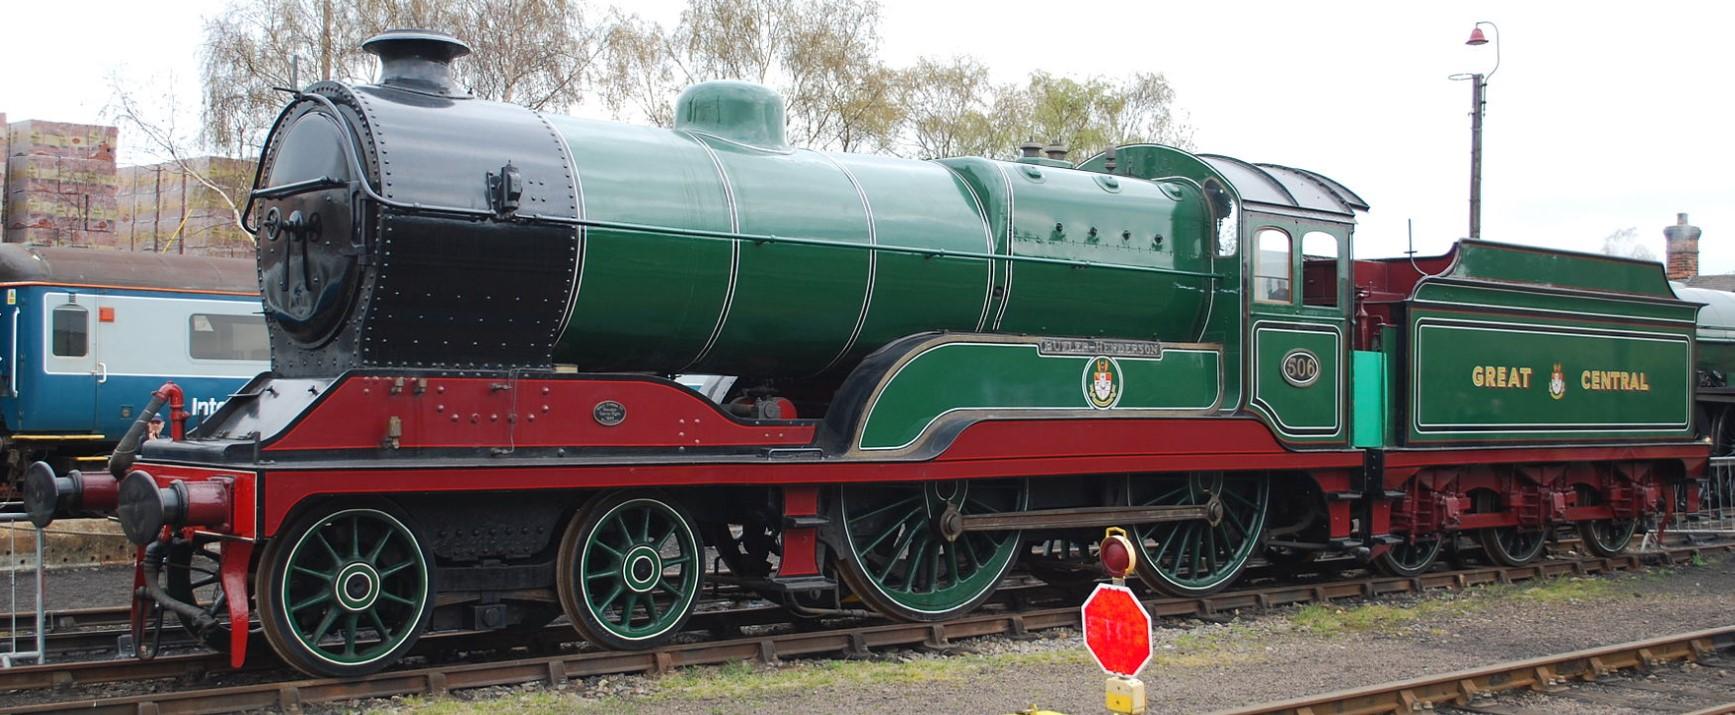 506 'Butler-Henderson' at Barrow Hill in April 2012. ©Hugh Llewelyn